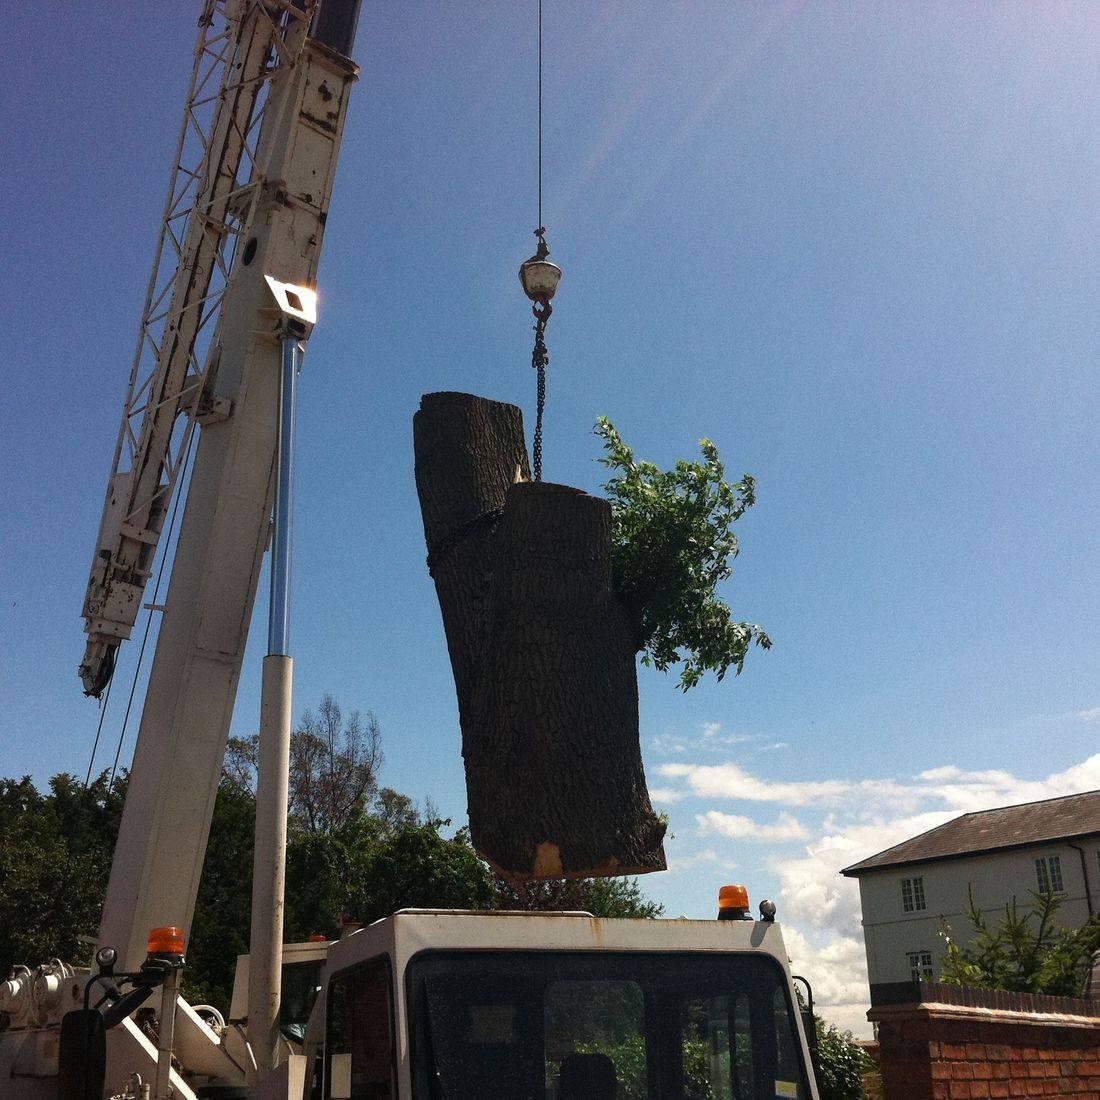 The Big Tree Specialists